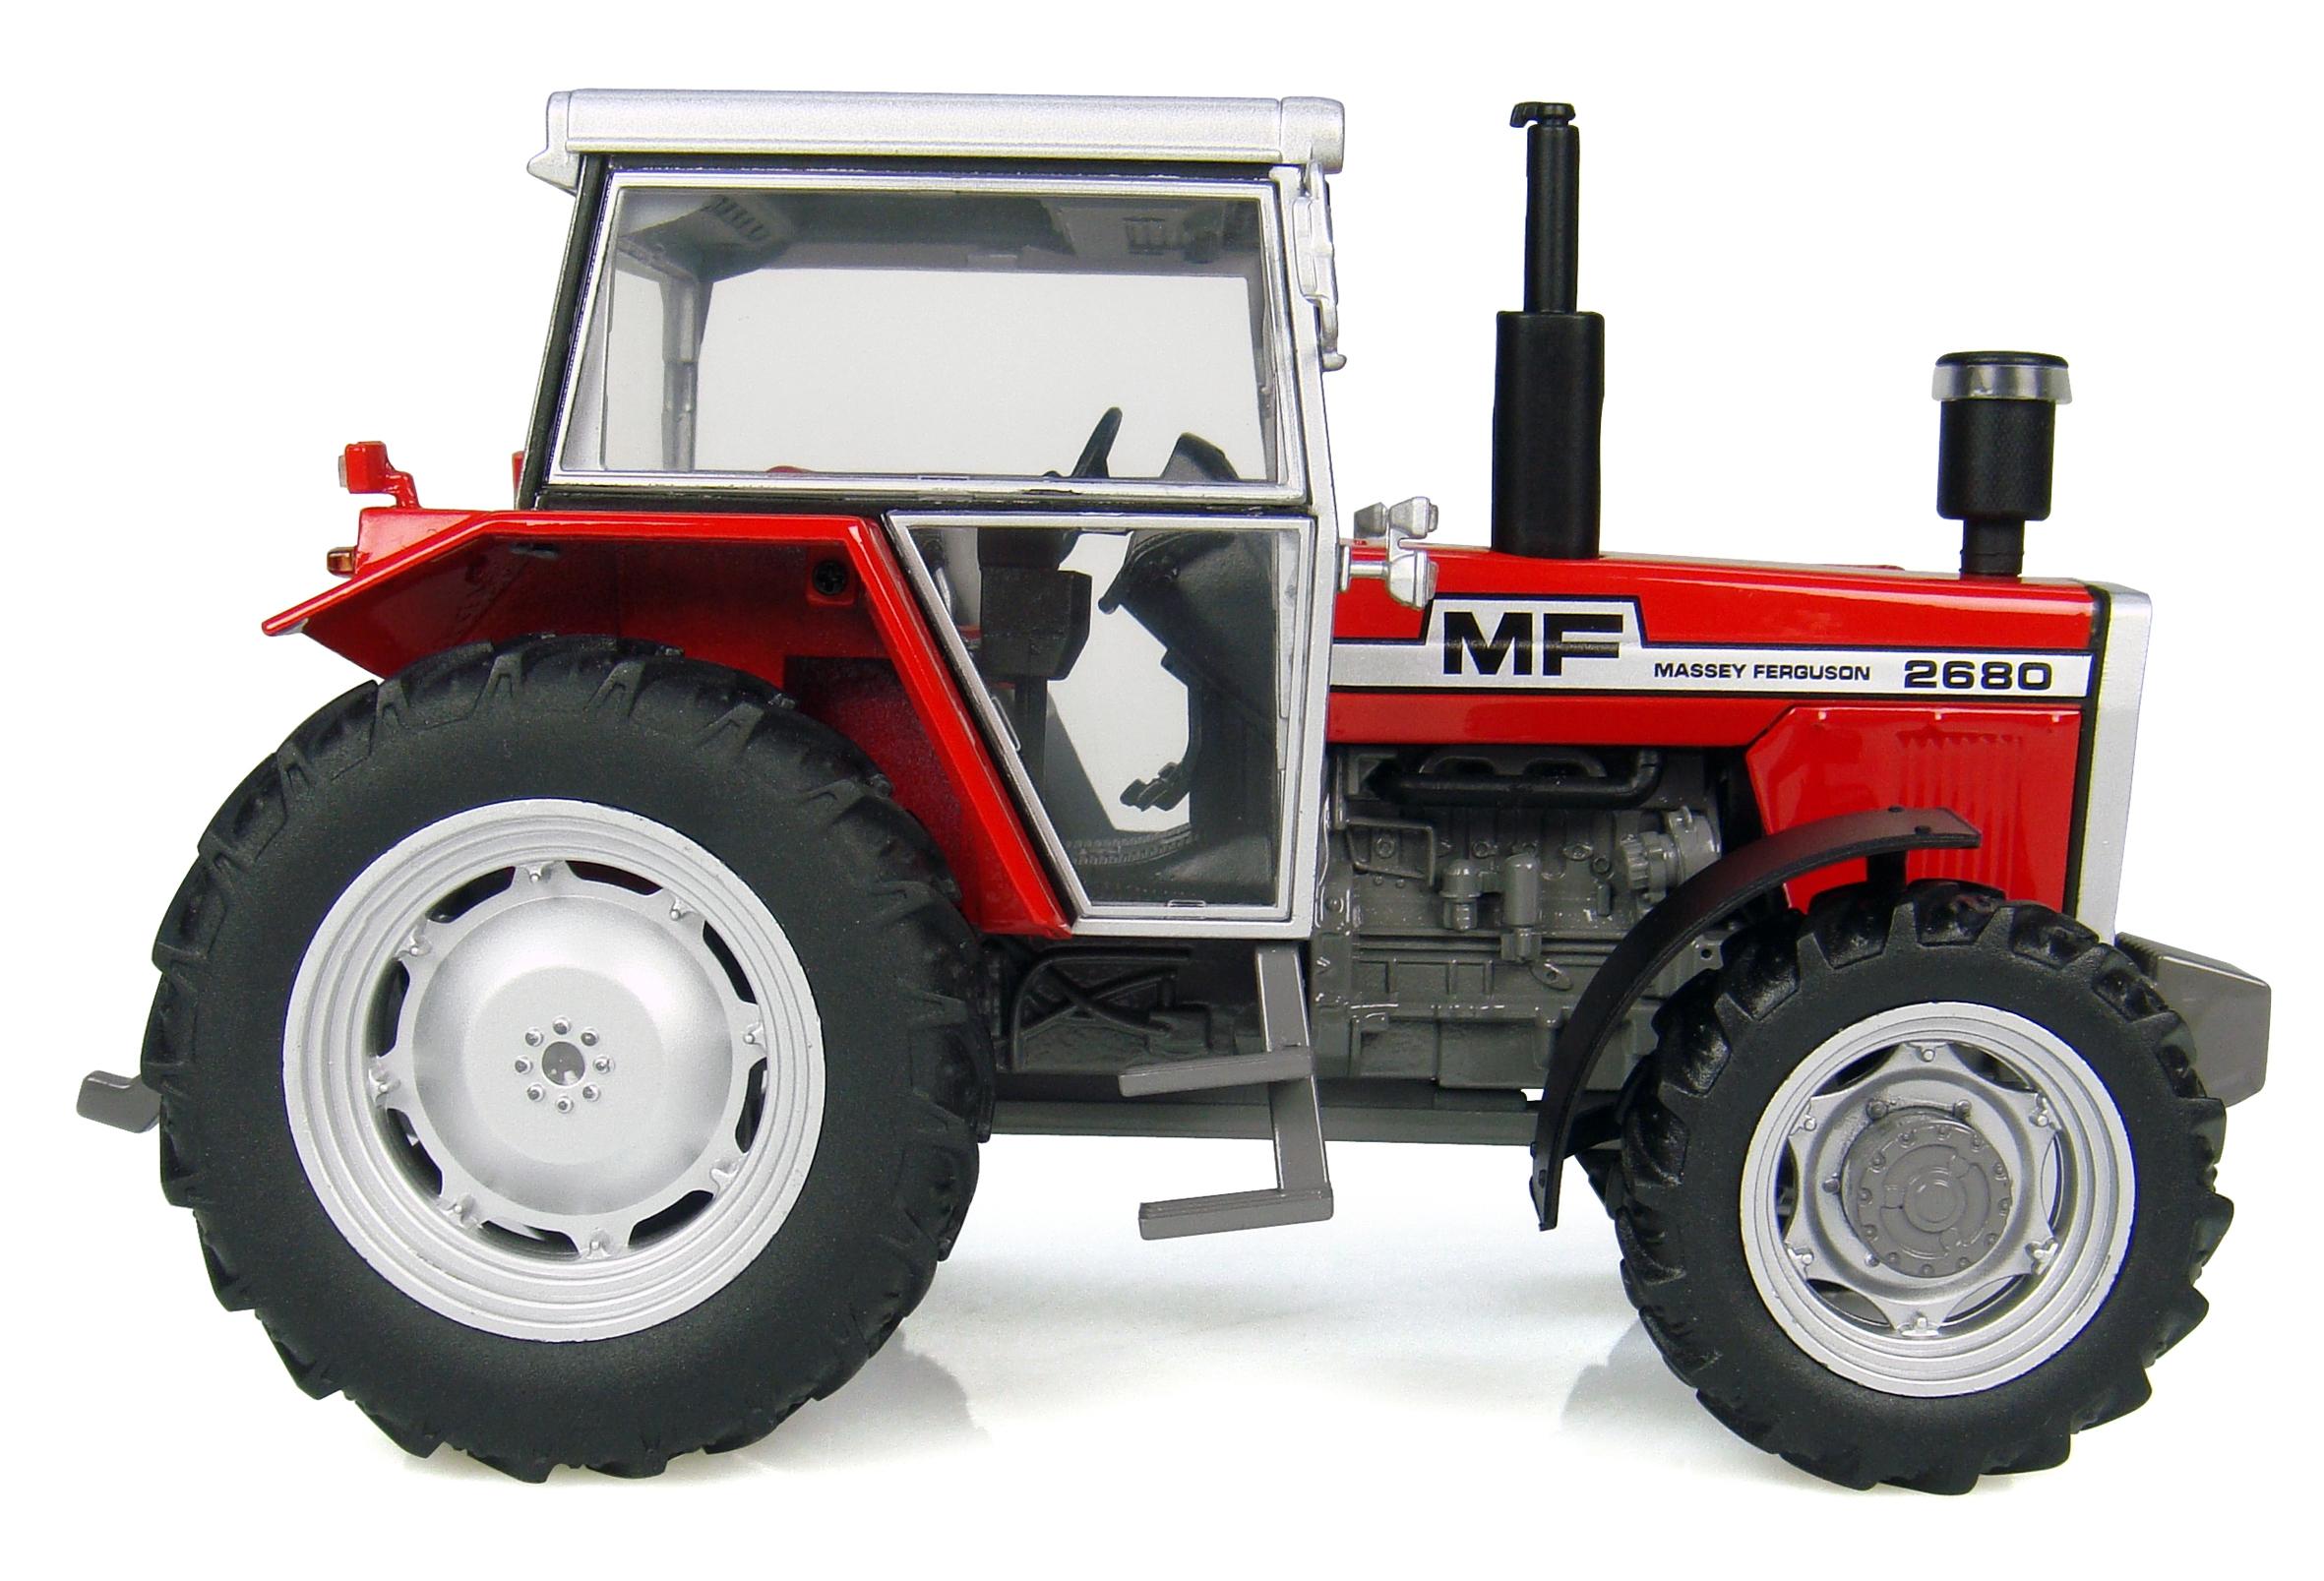 TRACTEUR MASSEY FERGUSON 2680 - 4WD (1980)